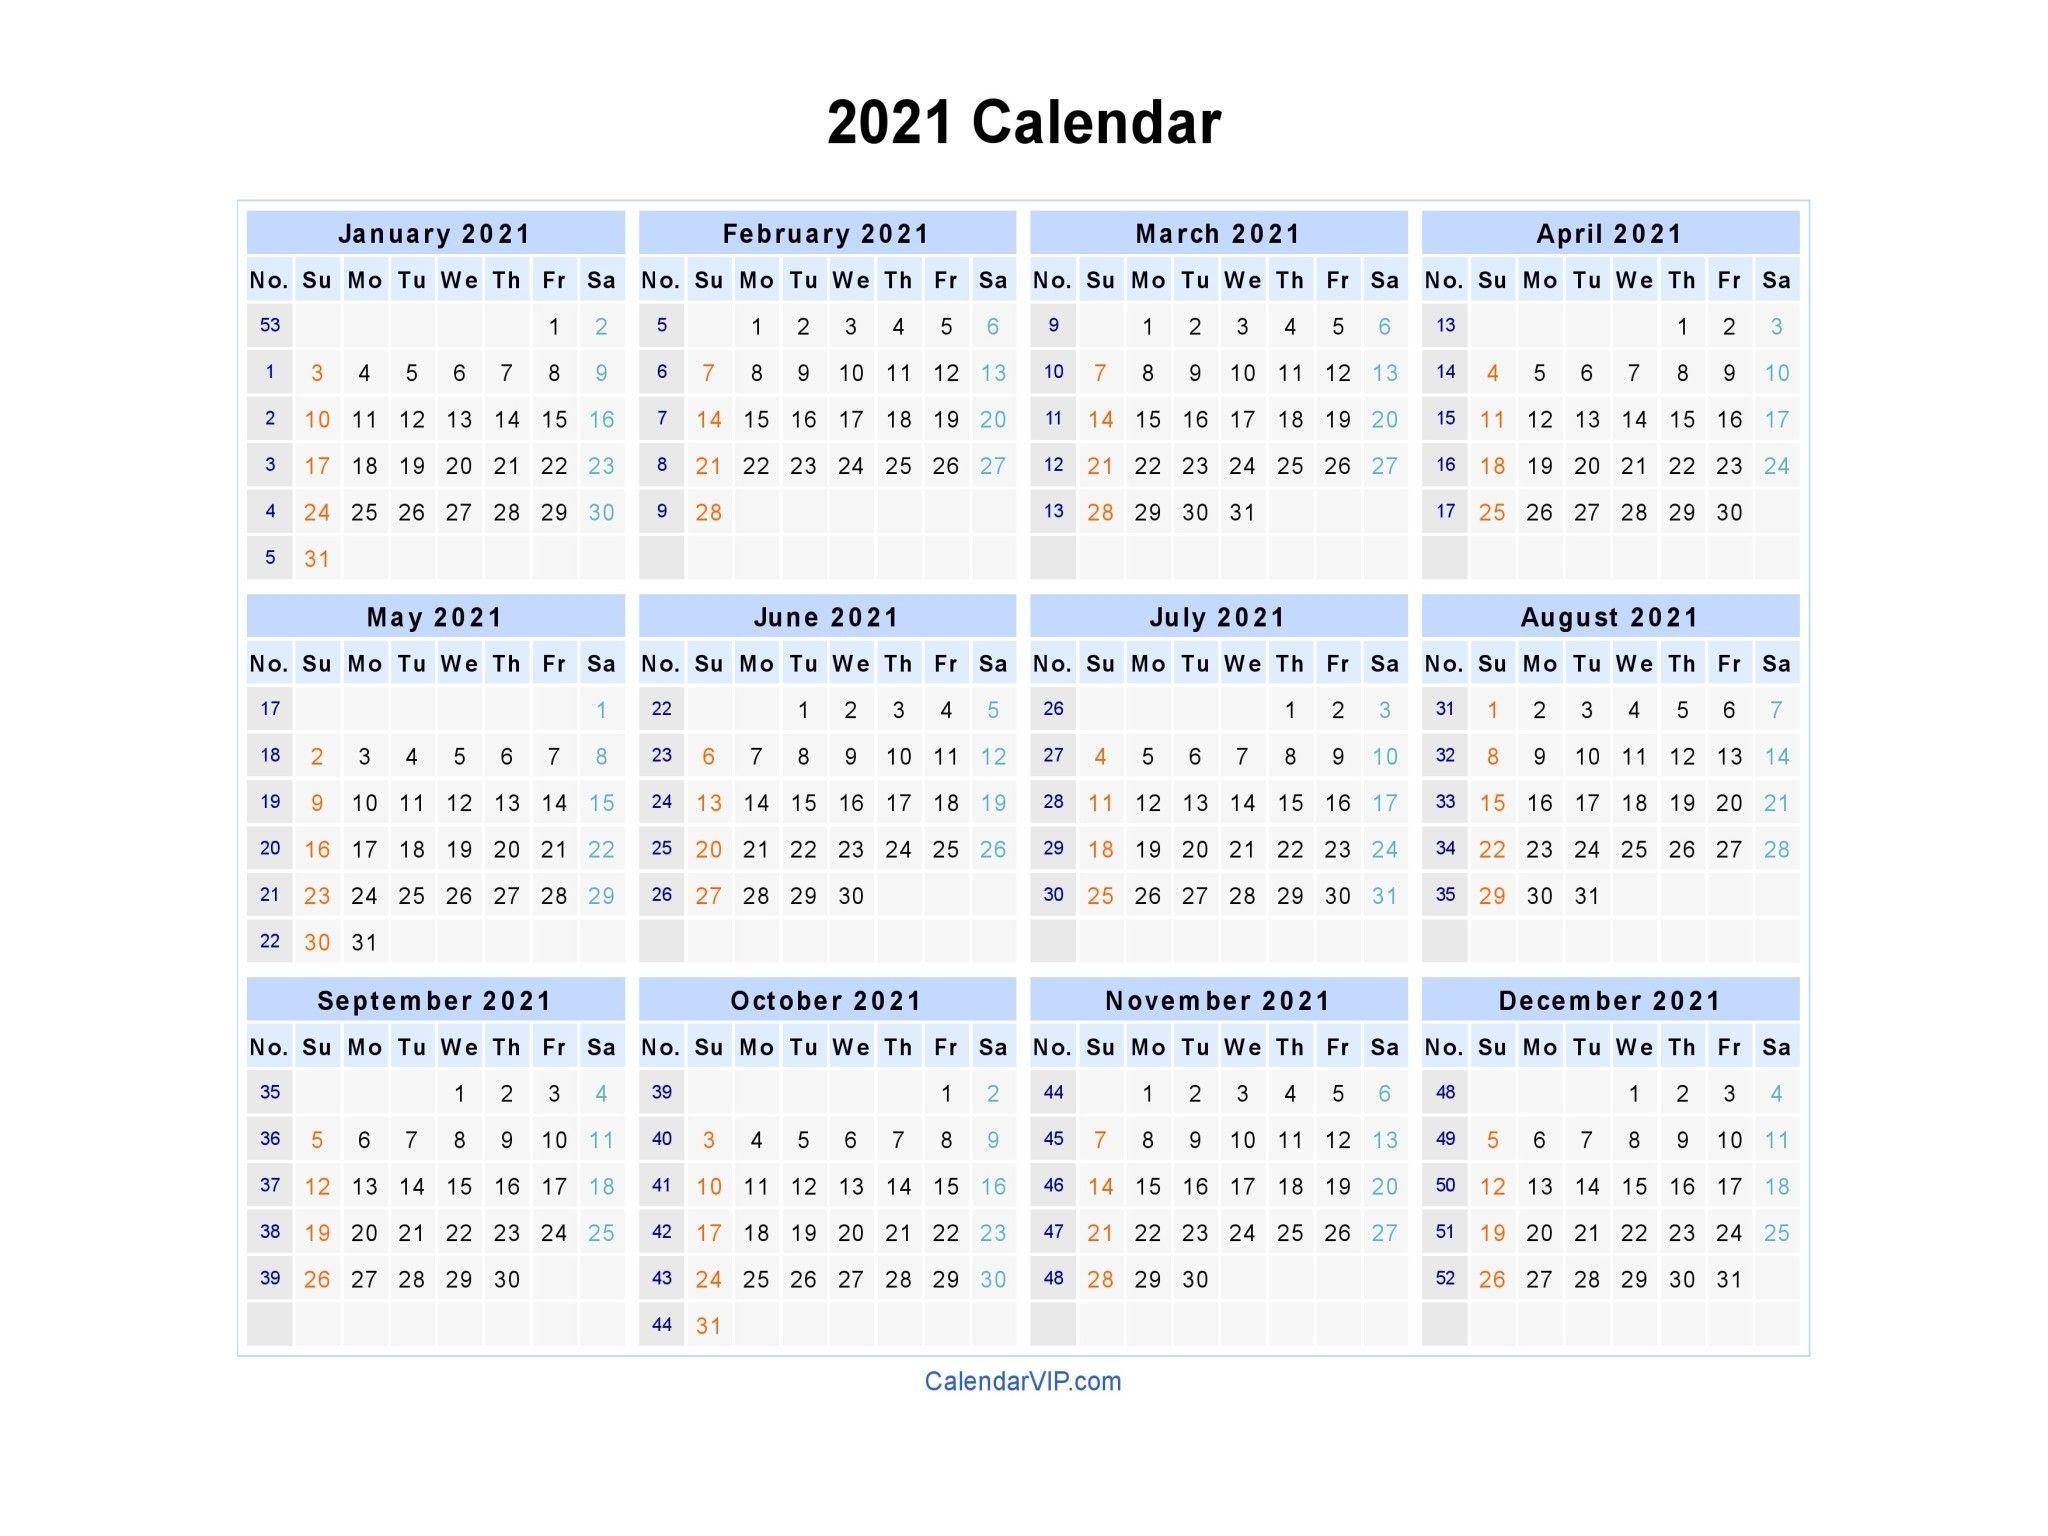 Blank 2021 Calendar Pdf Free Printable In 2020 | Calendar